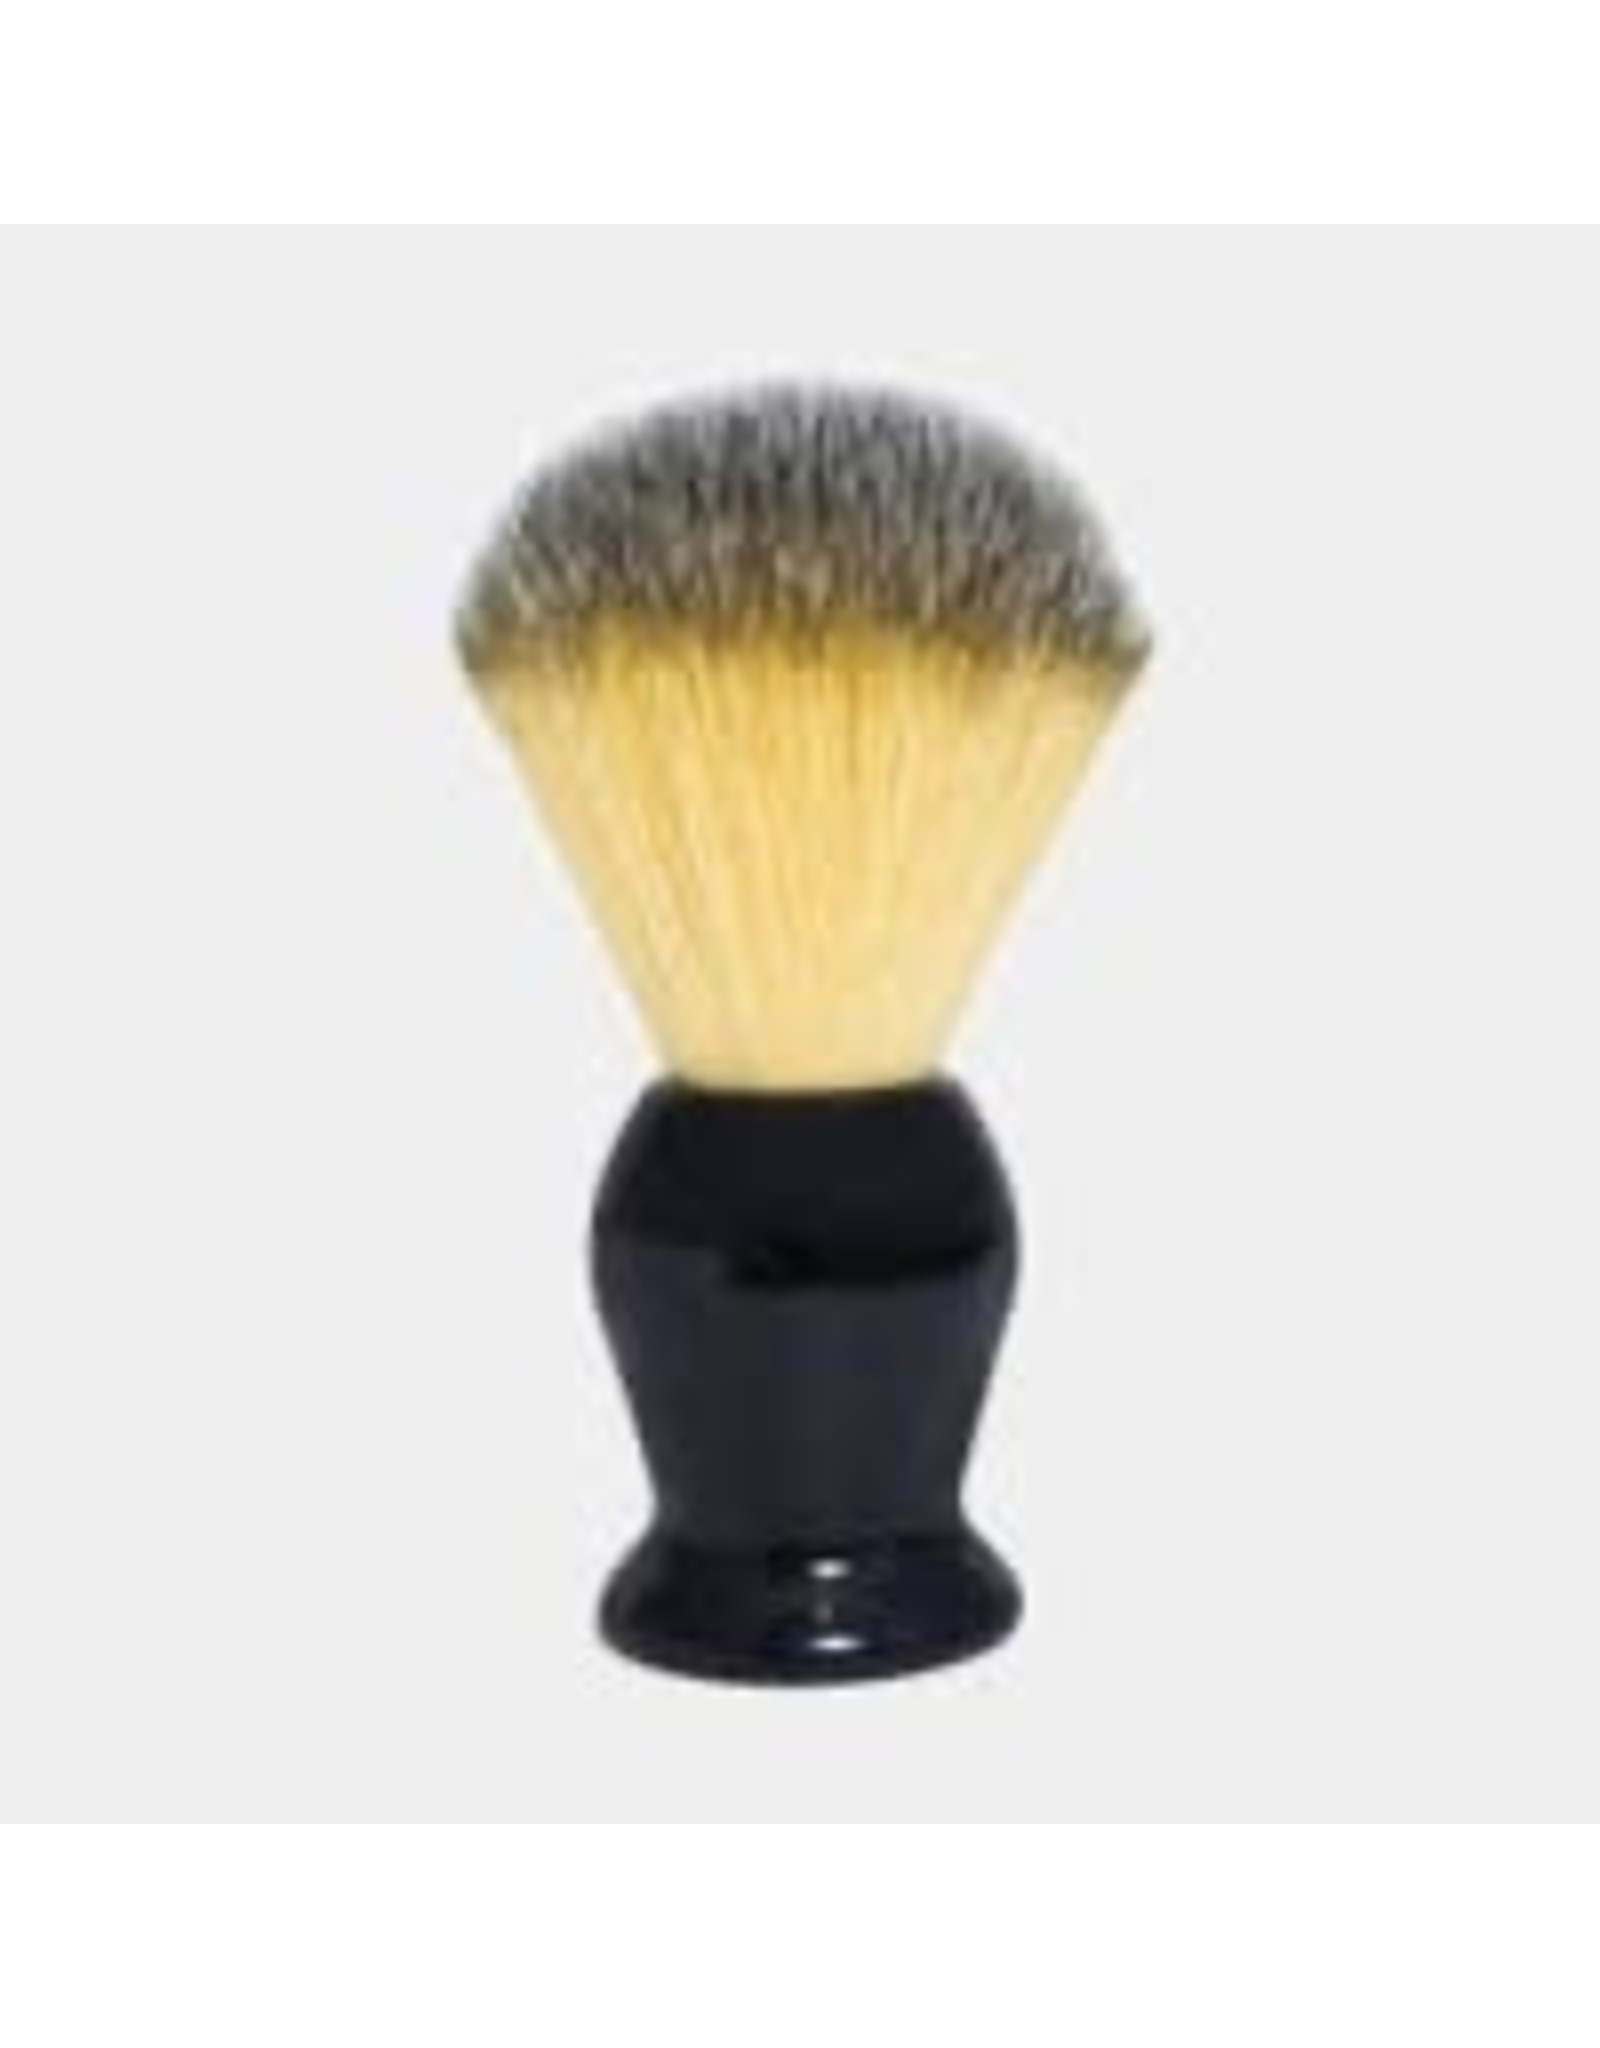 Rockwell Originals Rockwell Shave Brush